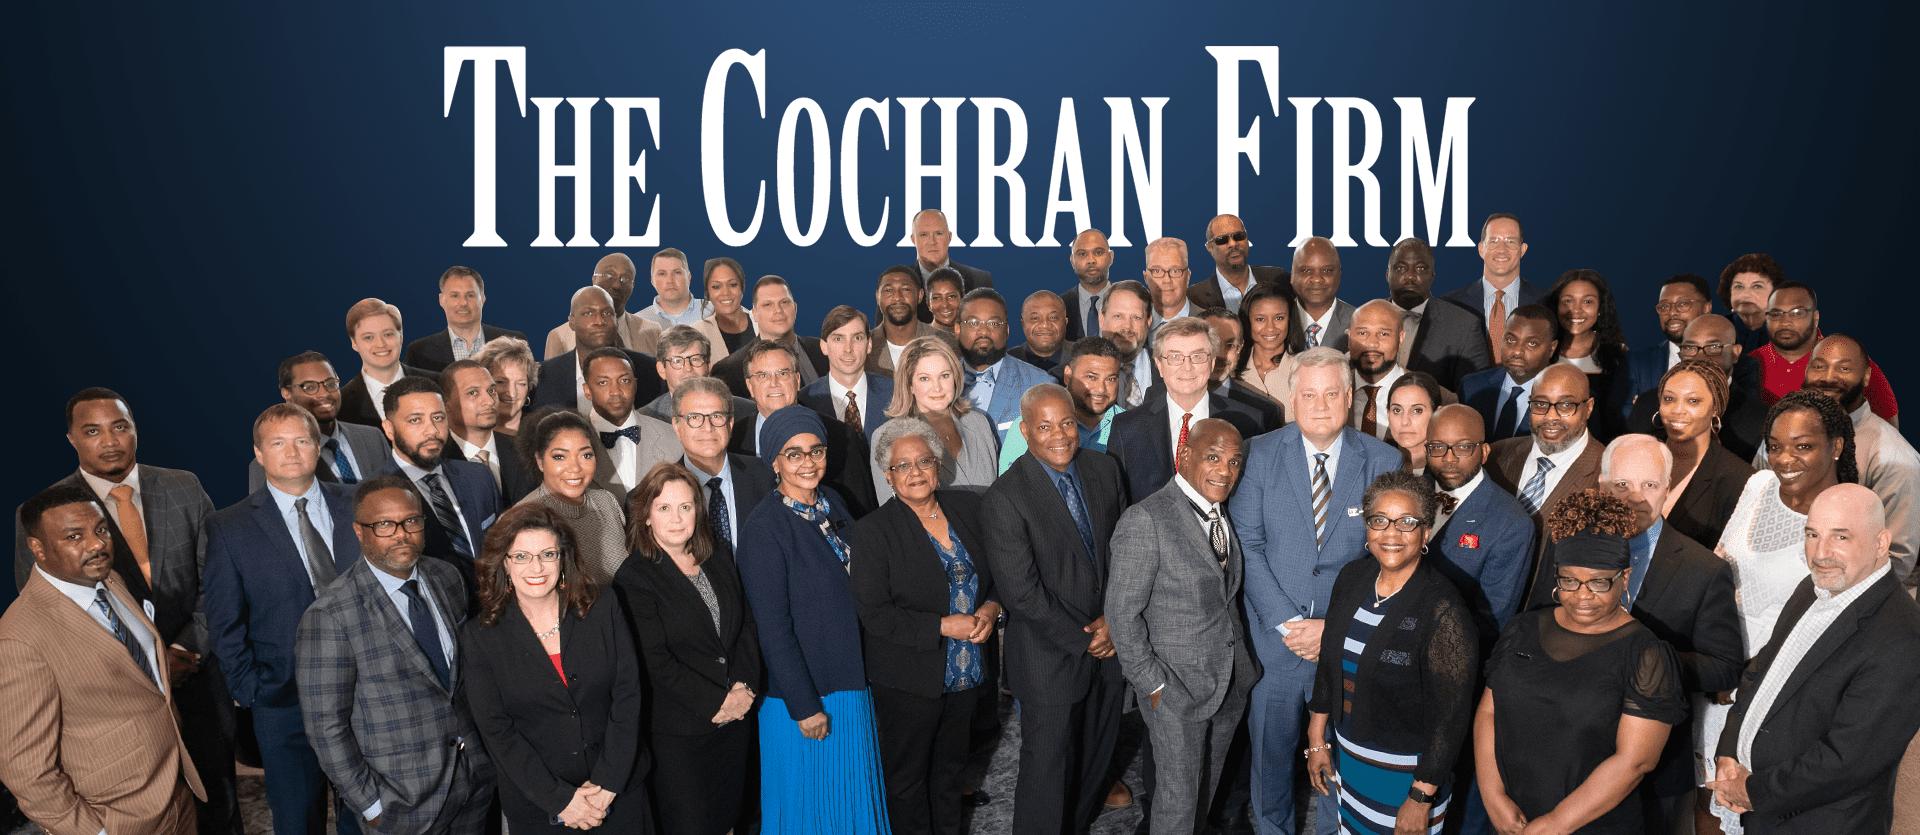 img-Cochran Team Background New Team